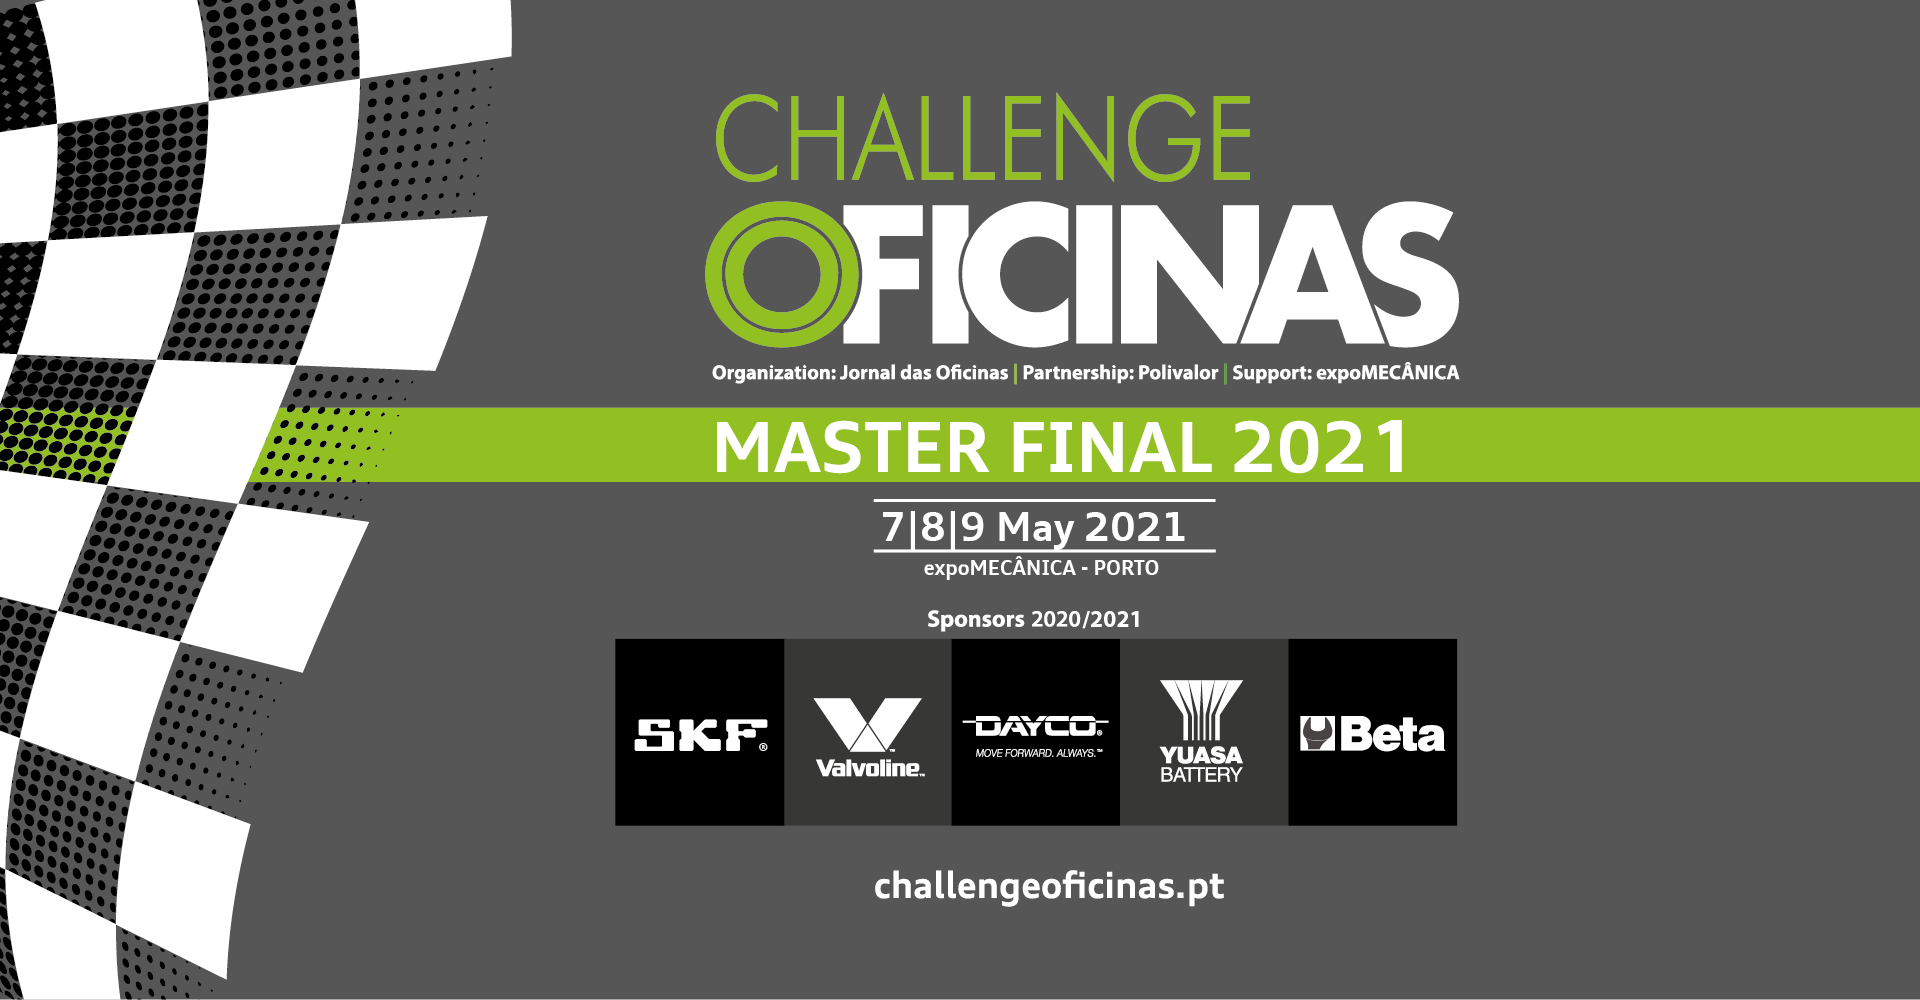 2020_banner_expomecanica_challenge_uk-01